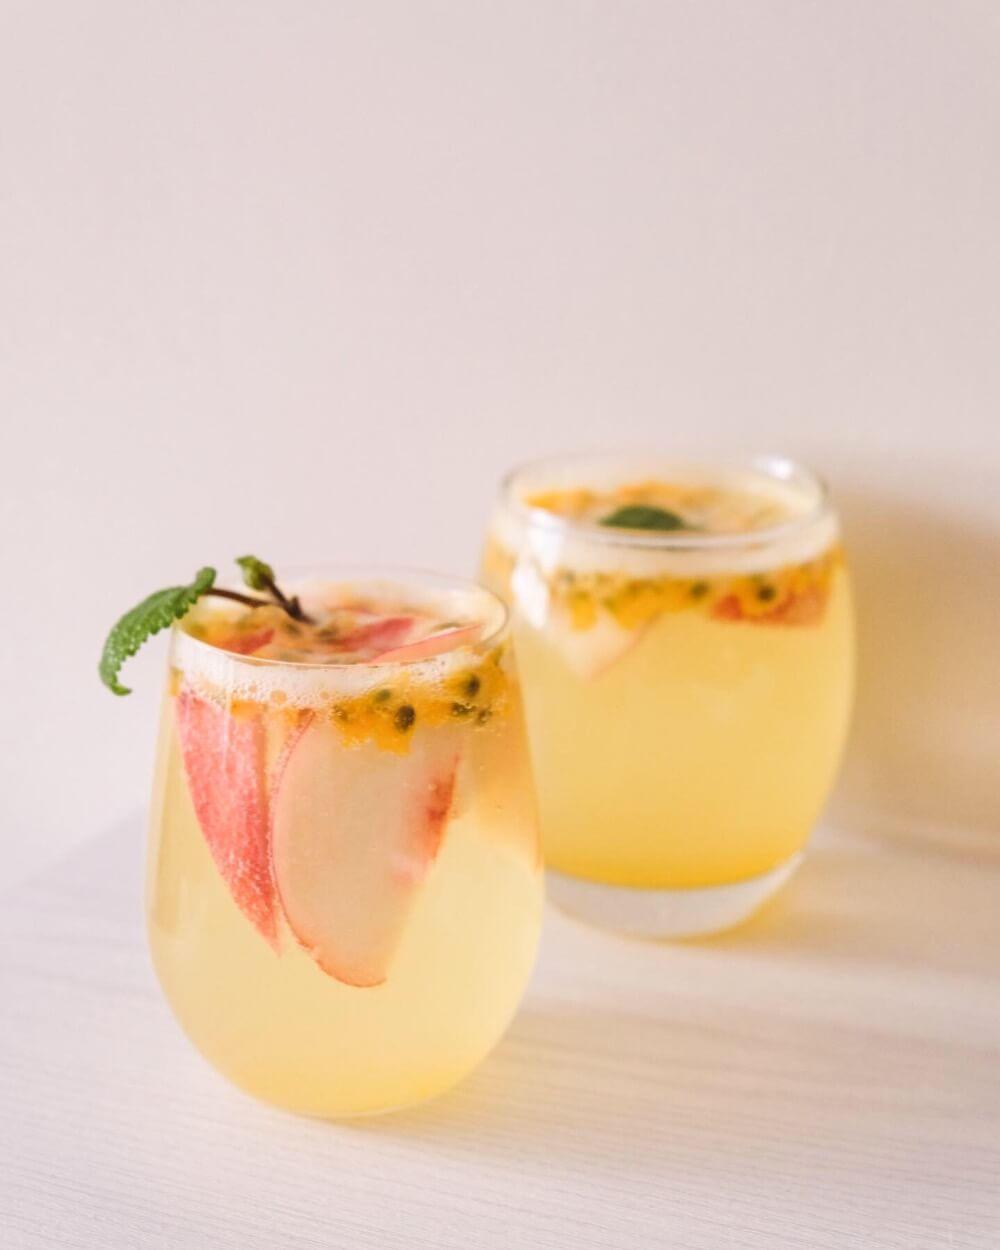 お家カフェ自製氣泡飲!輕鬆按壓「sodastream氣泡水機」製作夏季氣泡水果飲